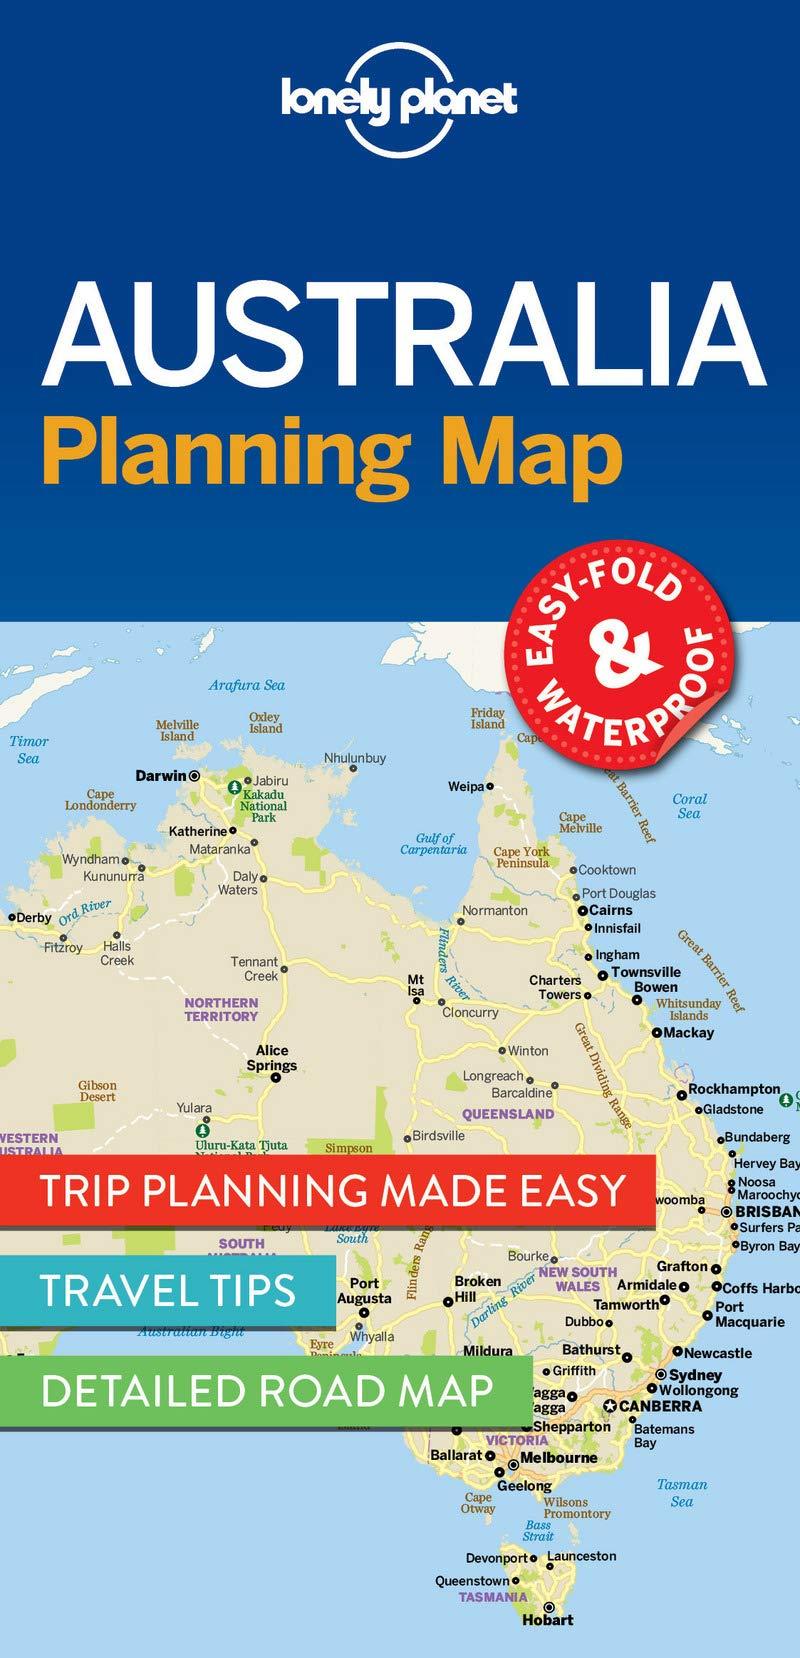 Map Of Australia Cape York Peninsula.Lonely Planet Australia Planning Map Lonely Planet 9781786579089